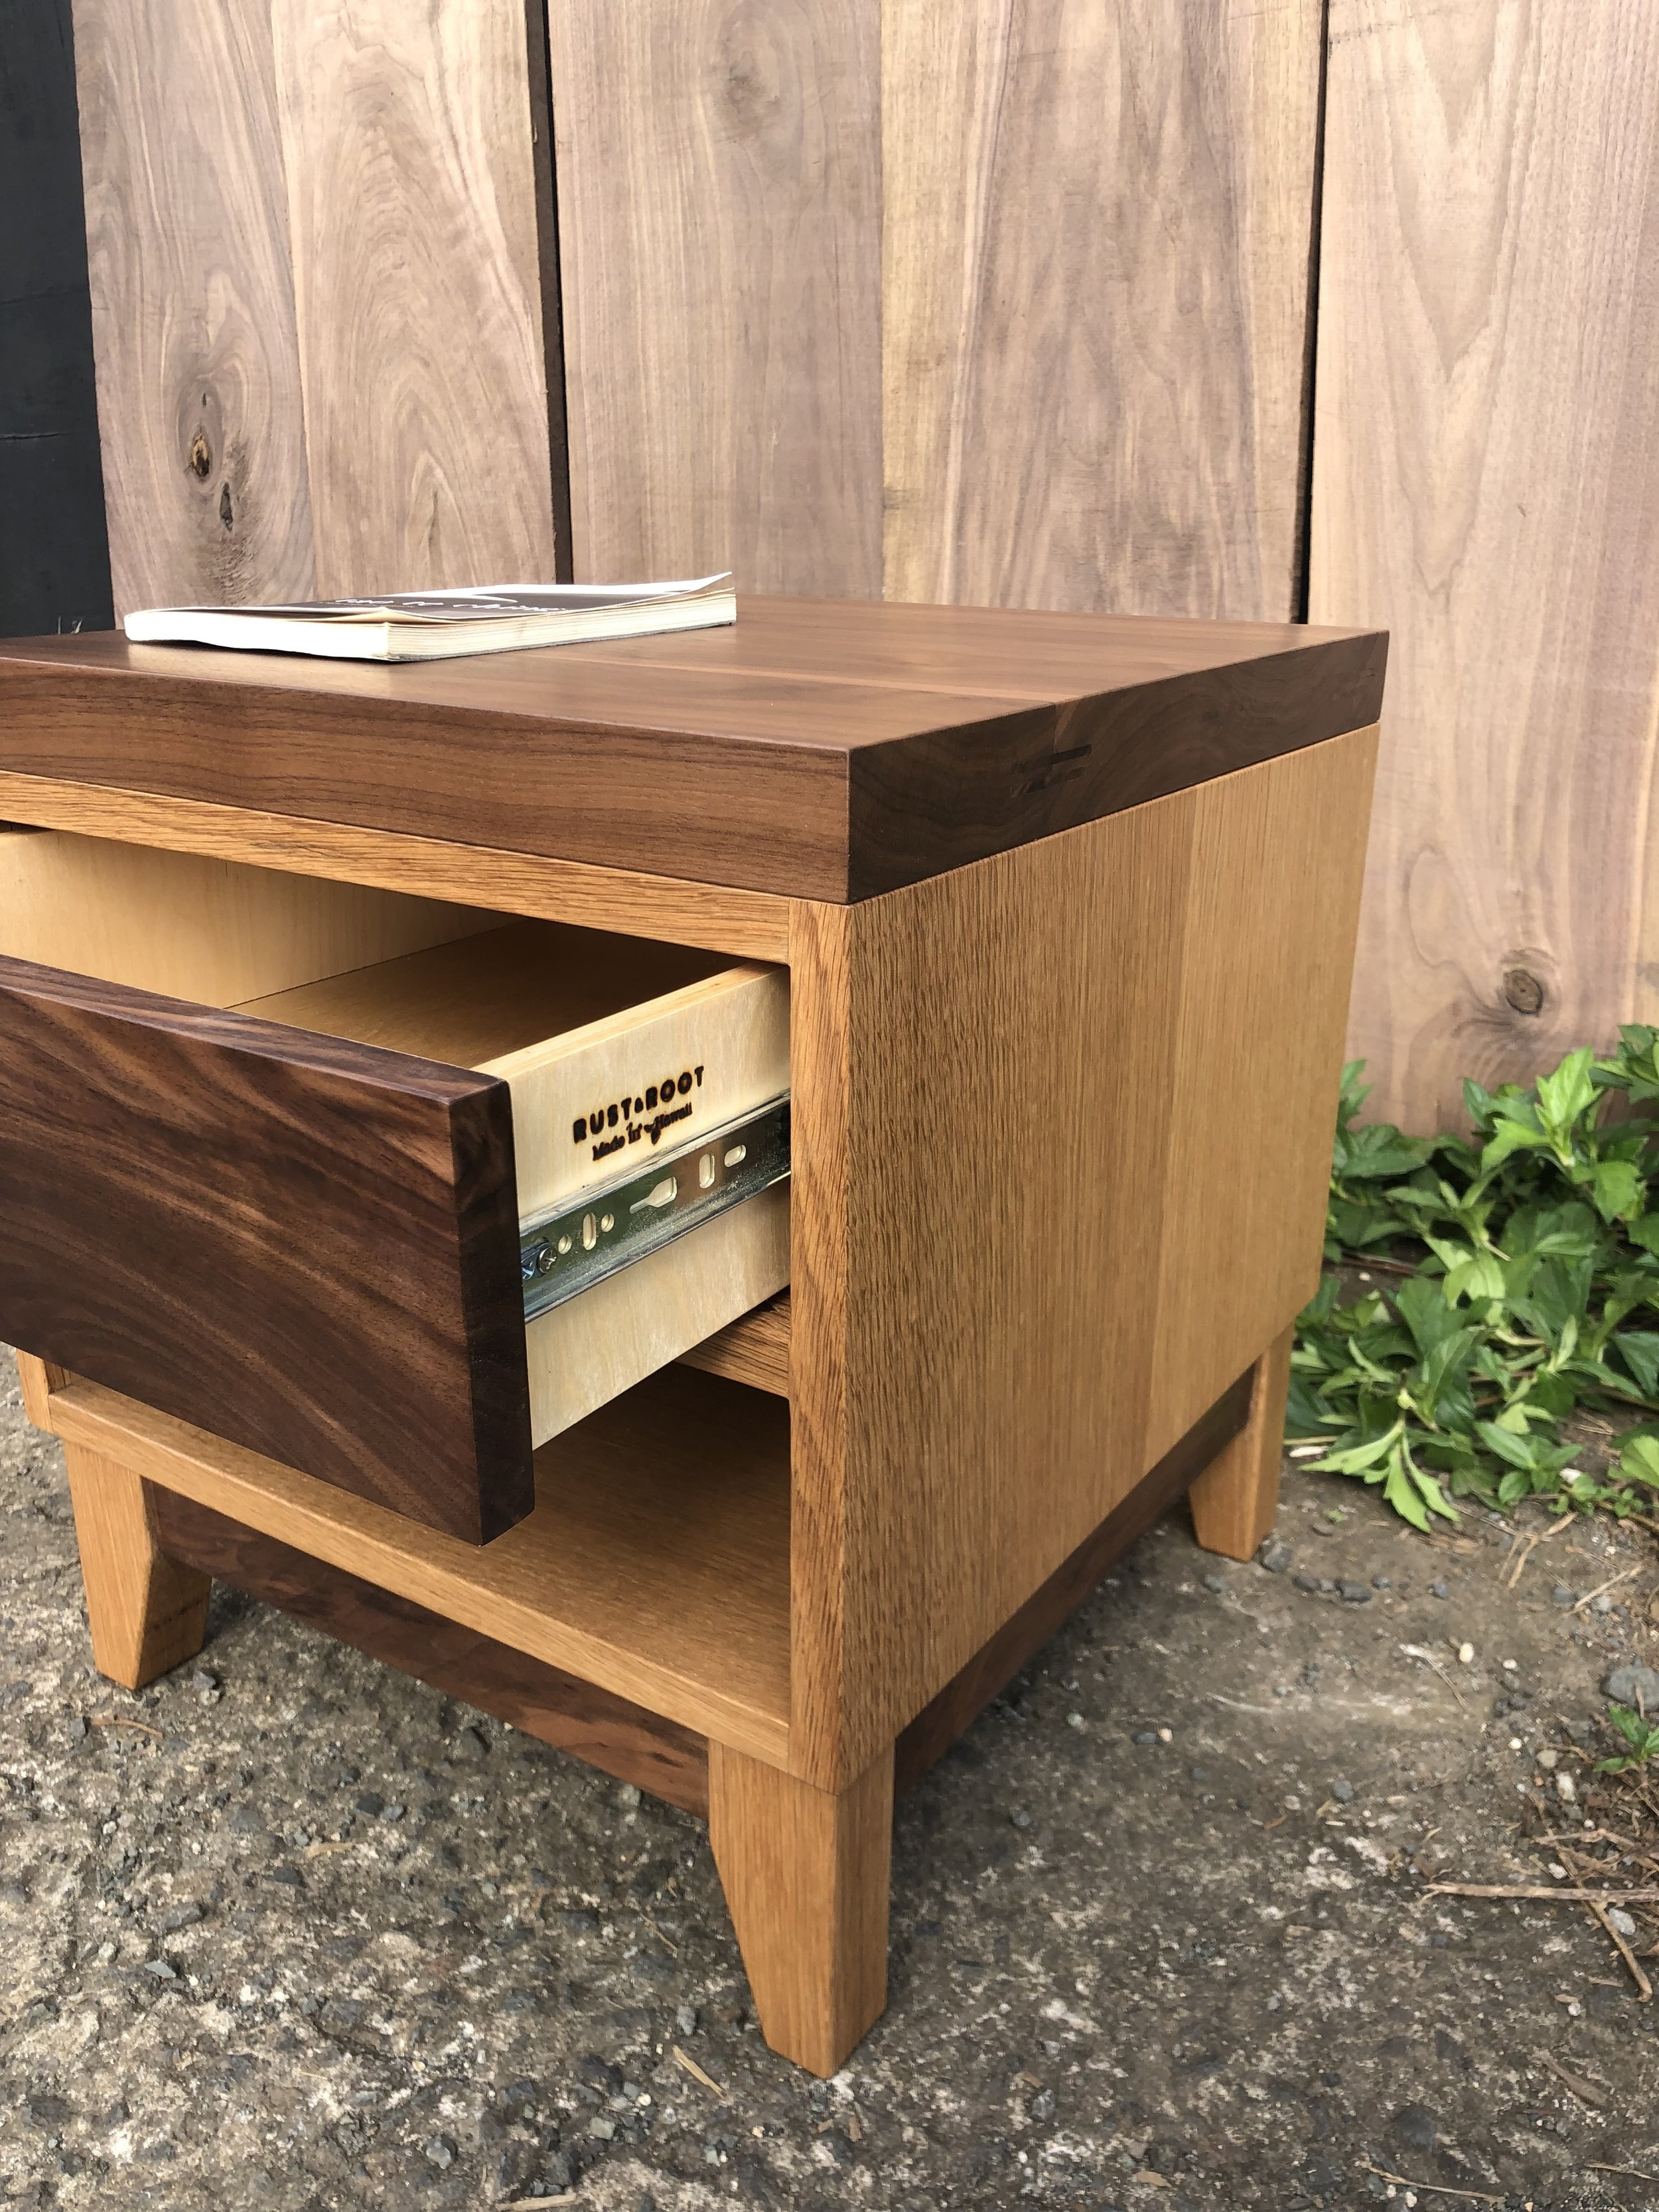 White oak and walnut bedside table.